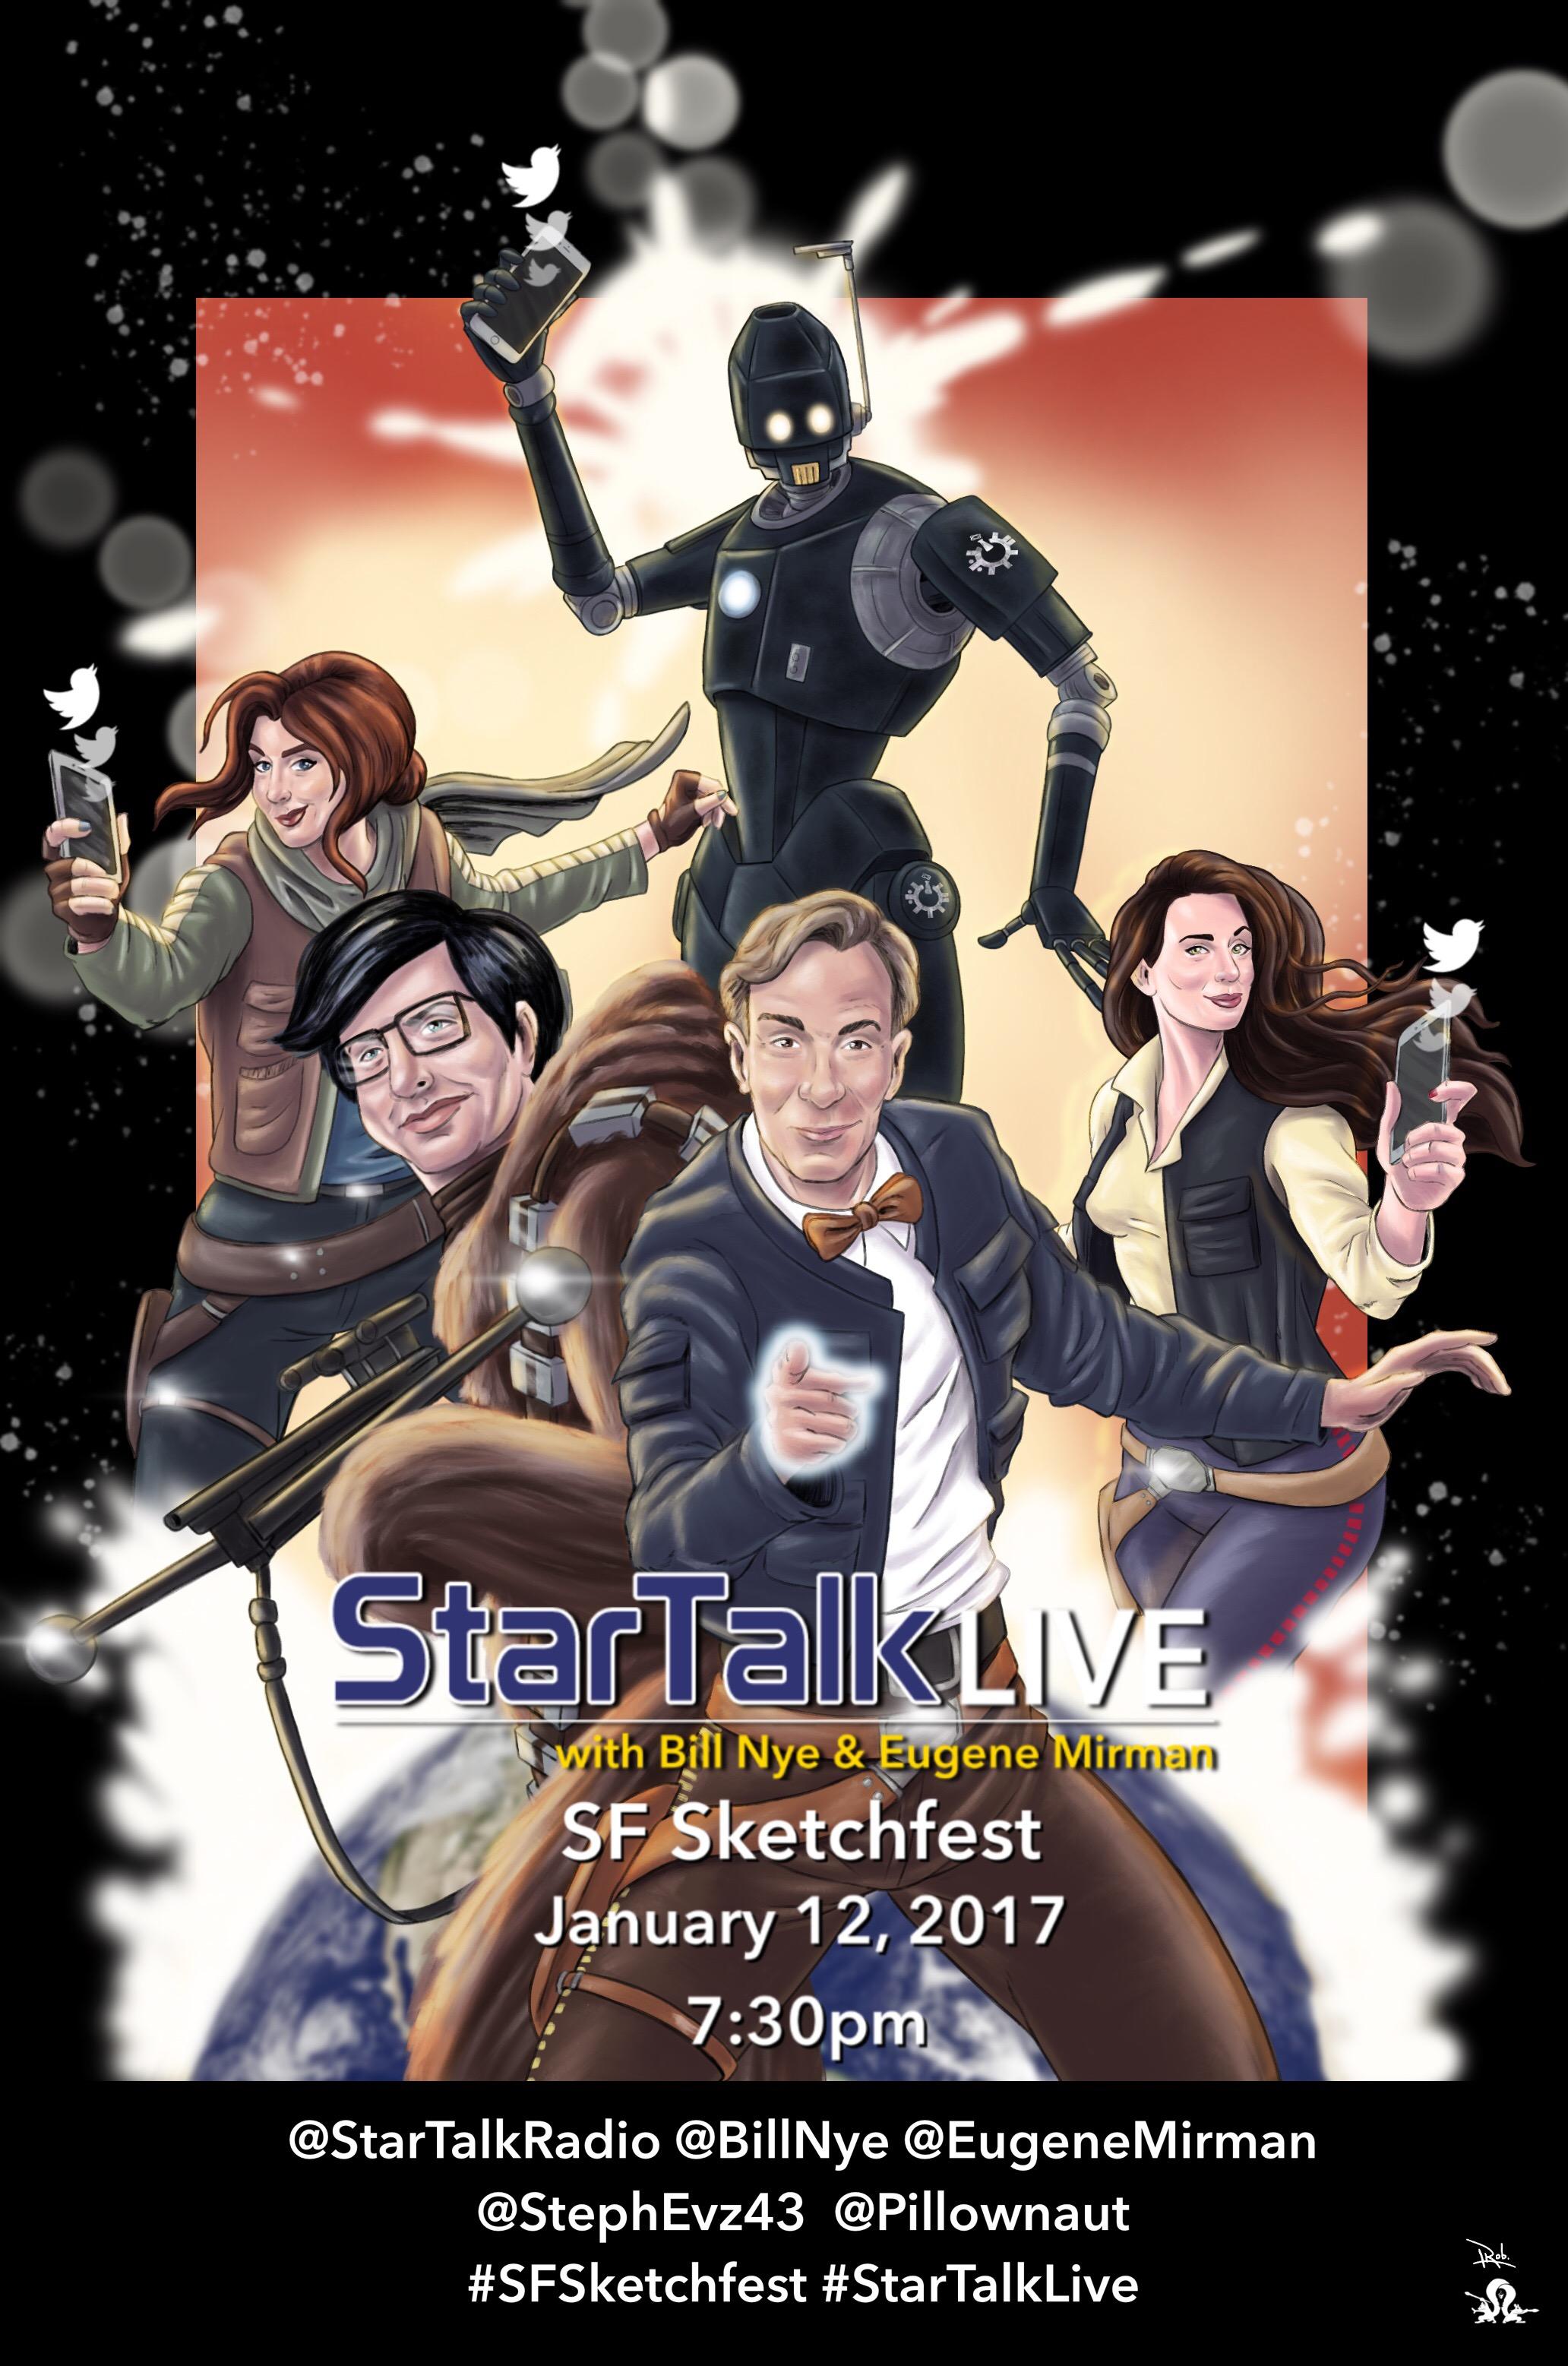 StarTalk LIVE 2017 Promo Art